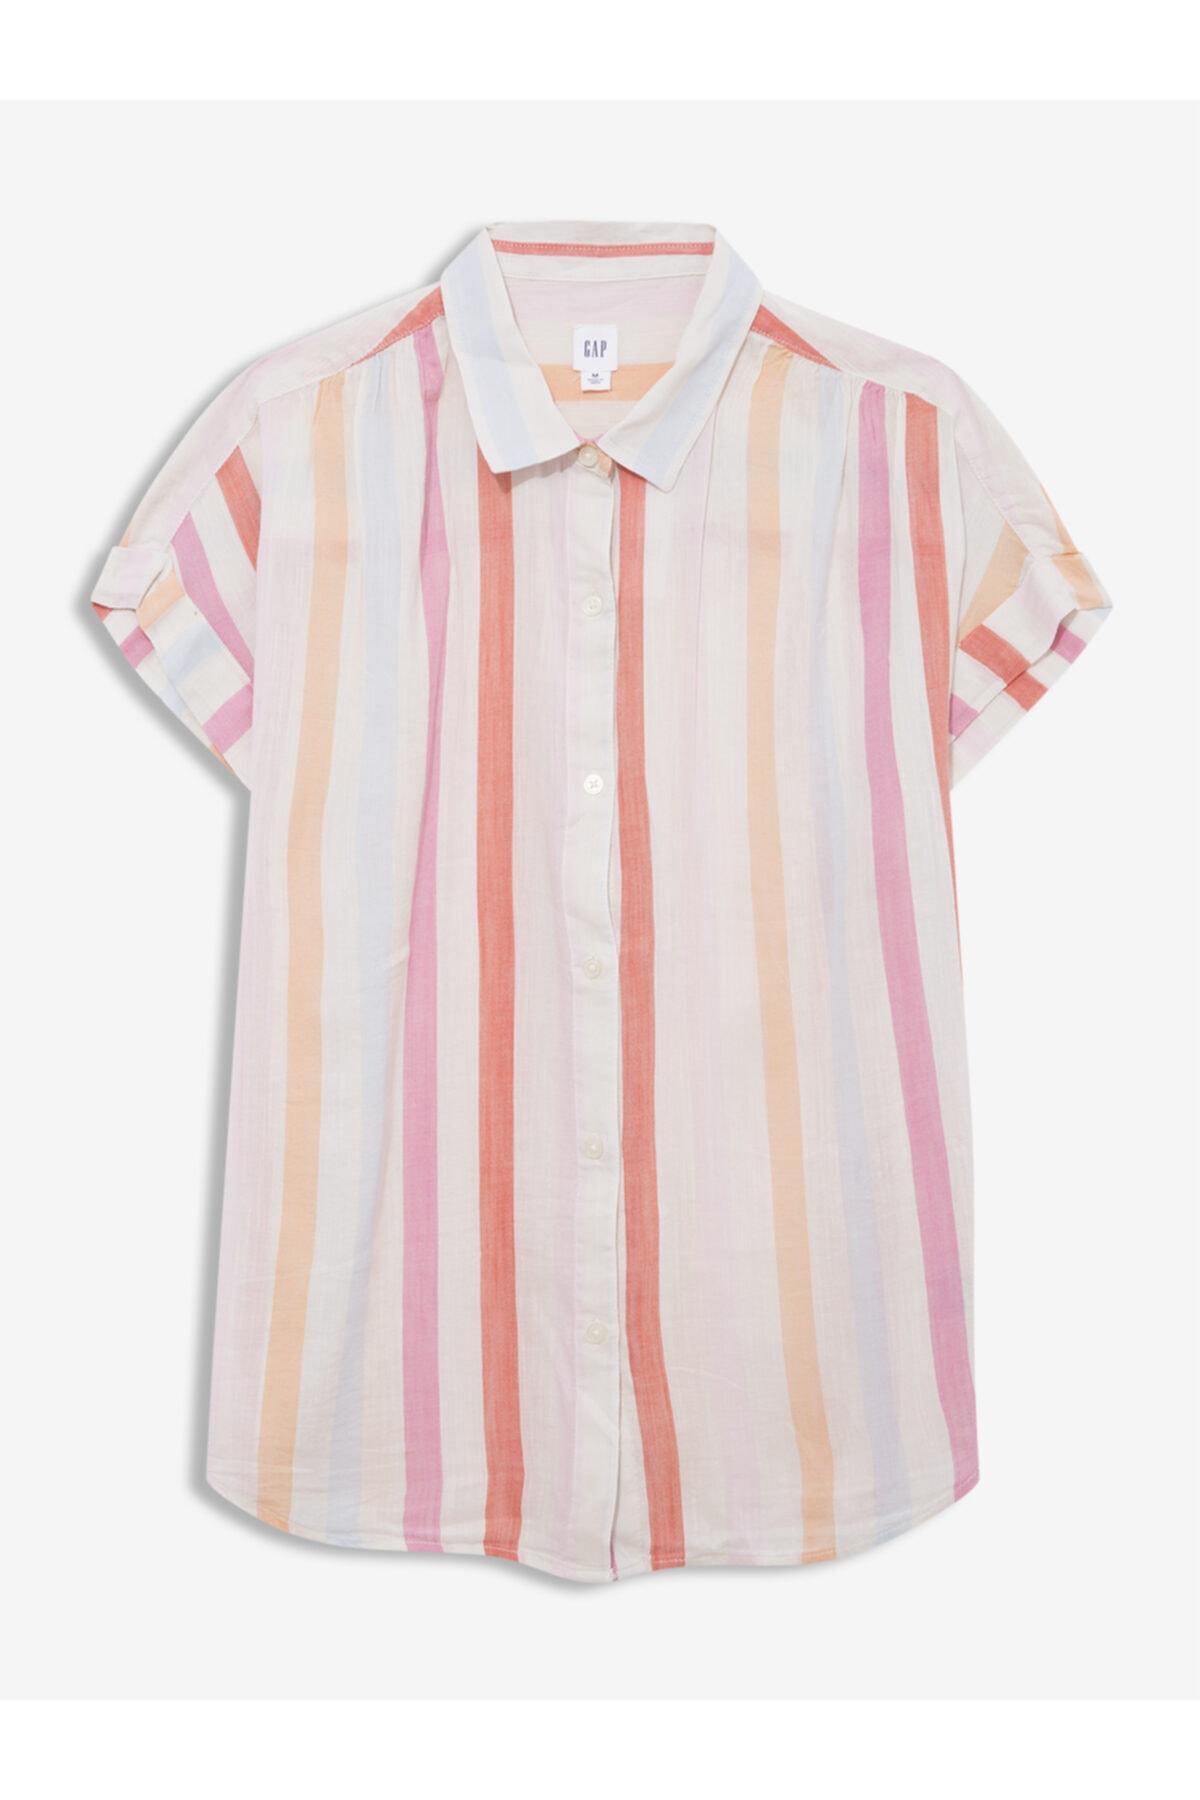 GAP Kısa Kollu Gömlek 1